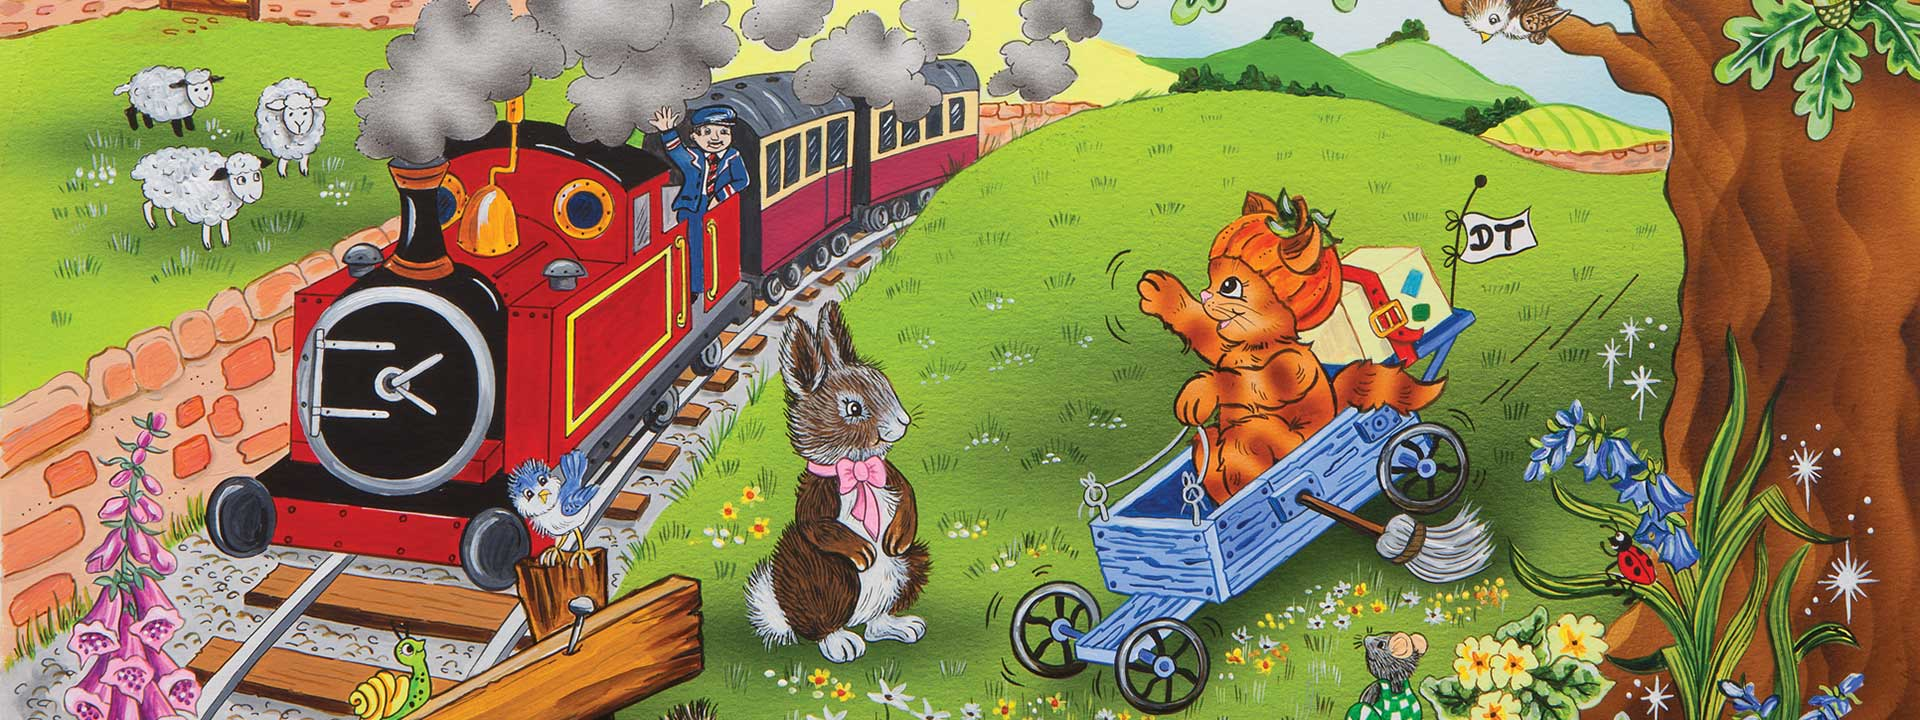 BTFD Train and animals